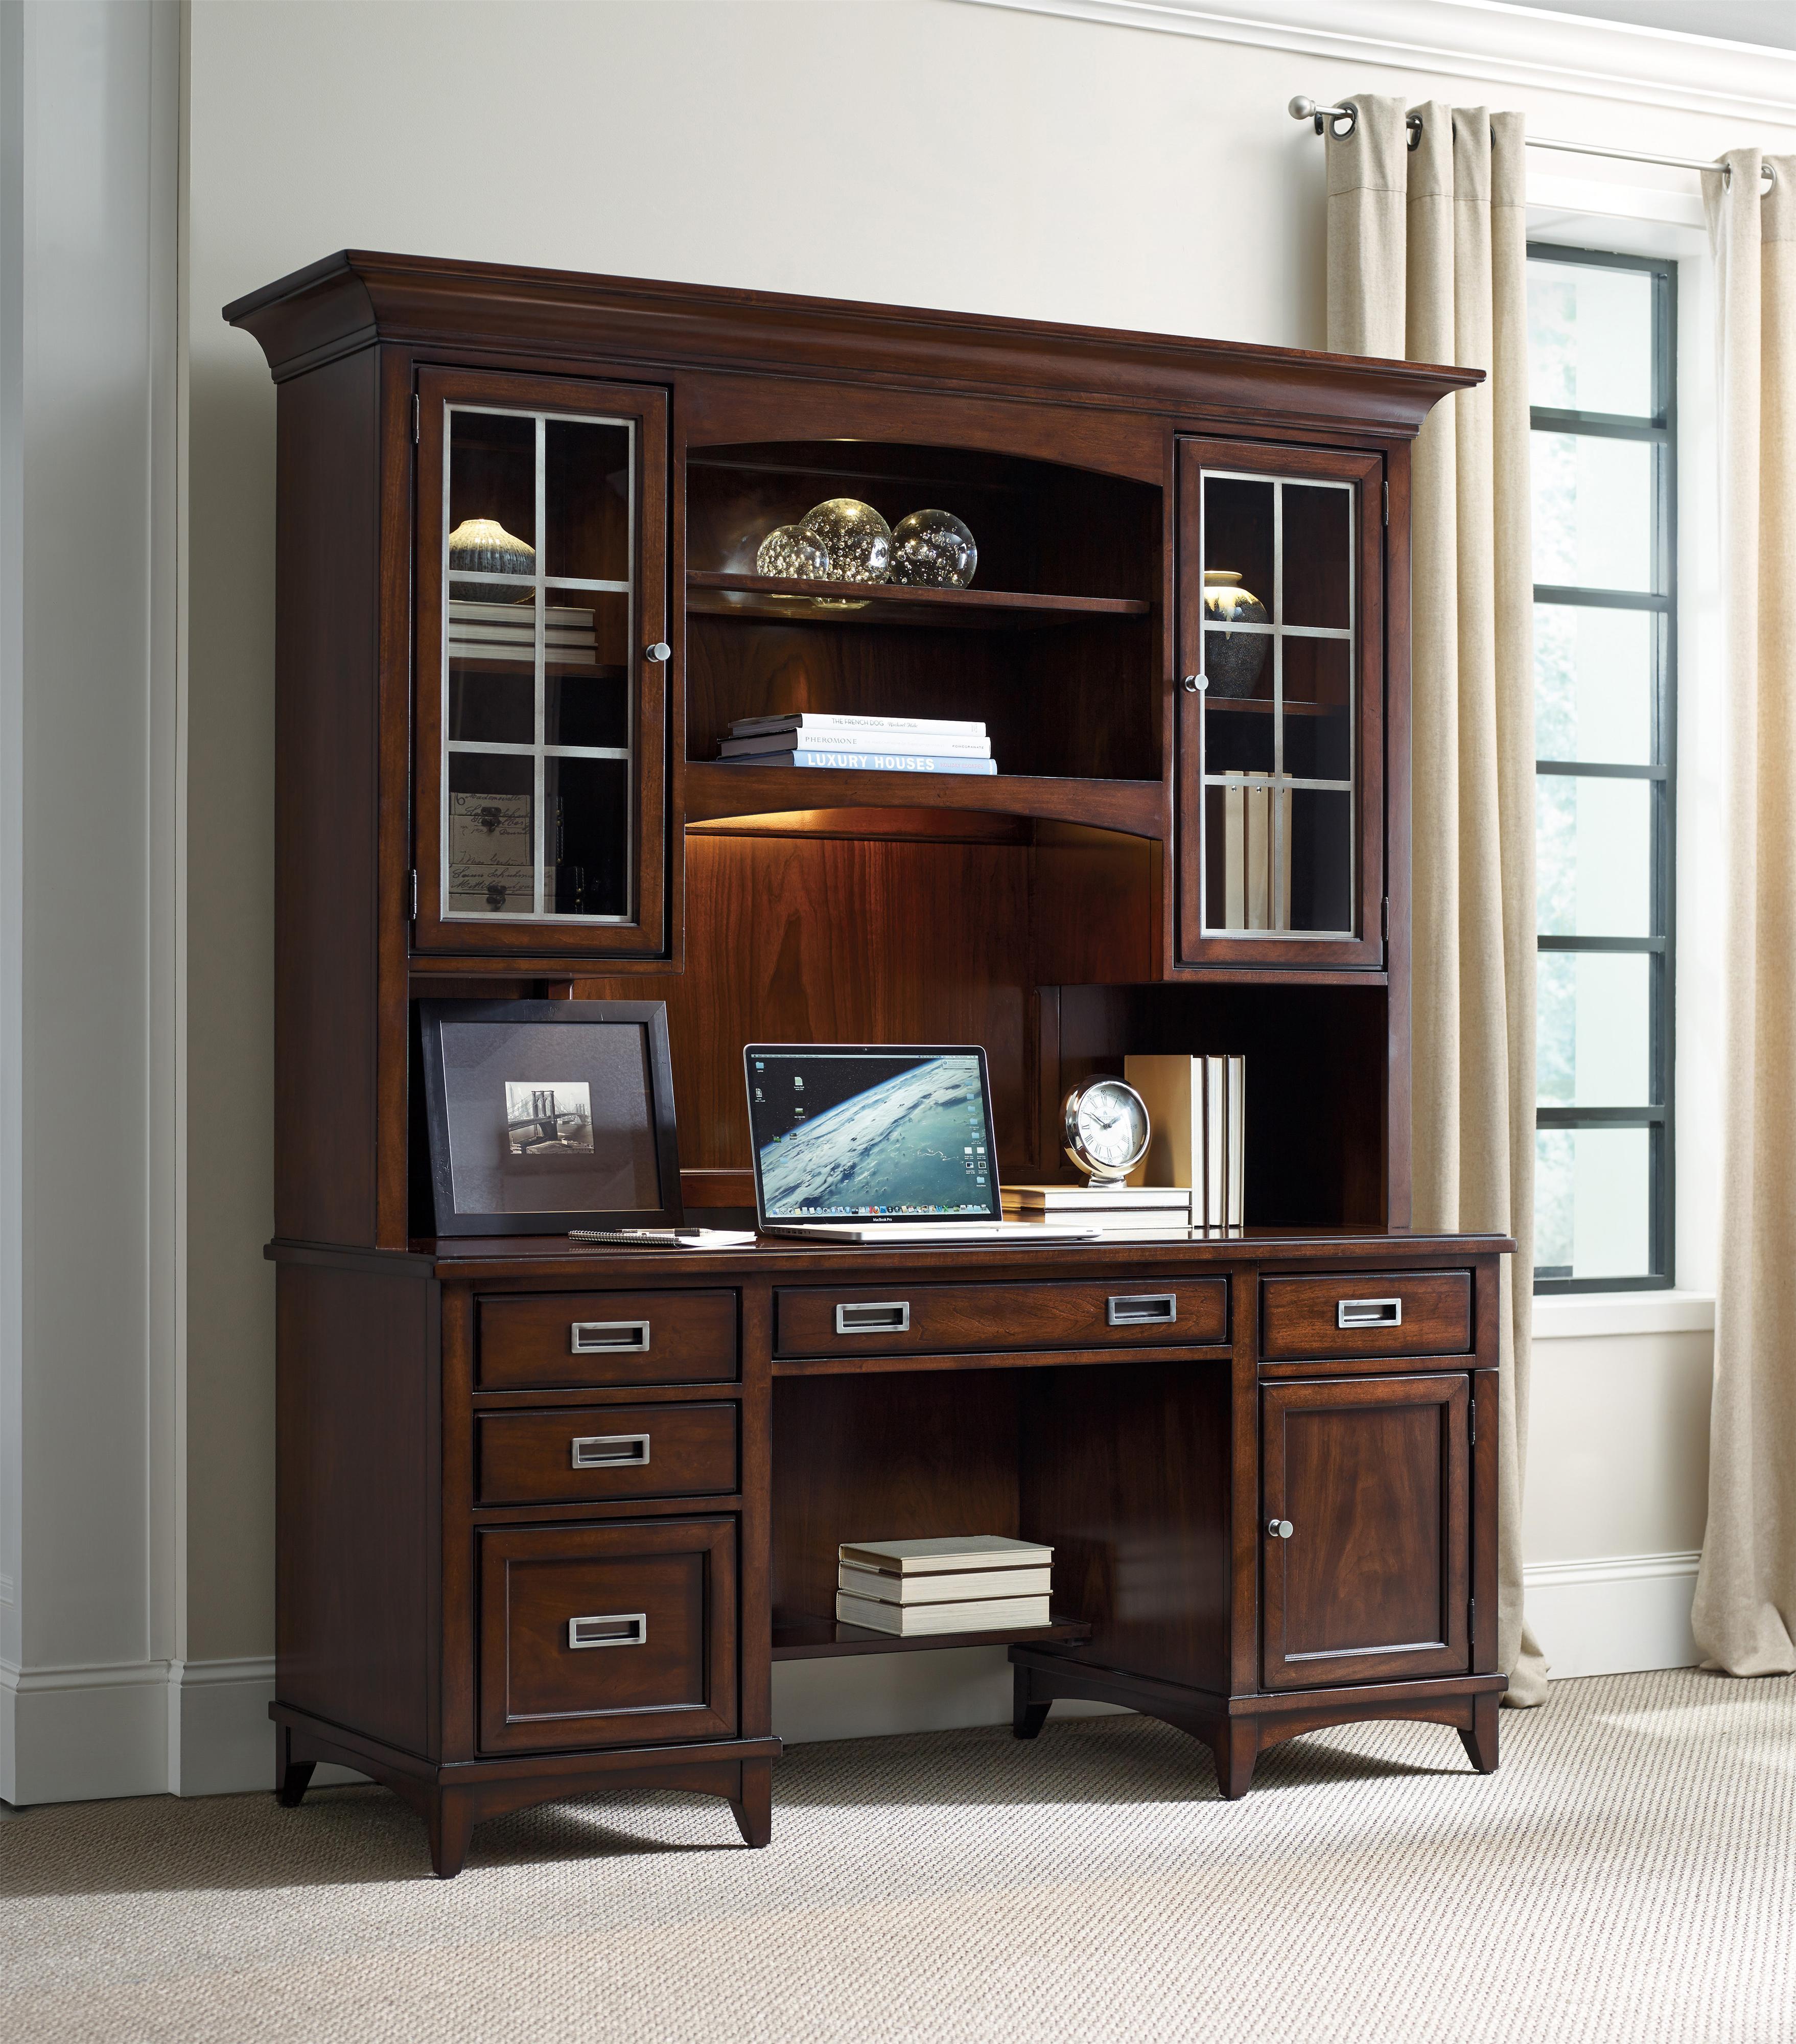 Hooker Furniture Latitude 5167-10464 Walnut Computer